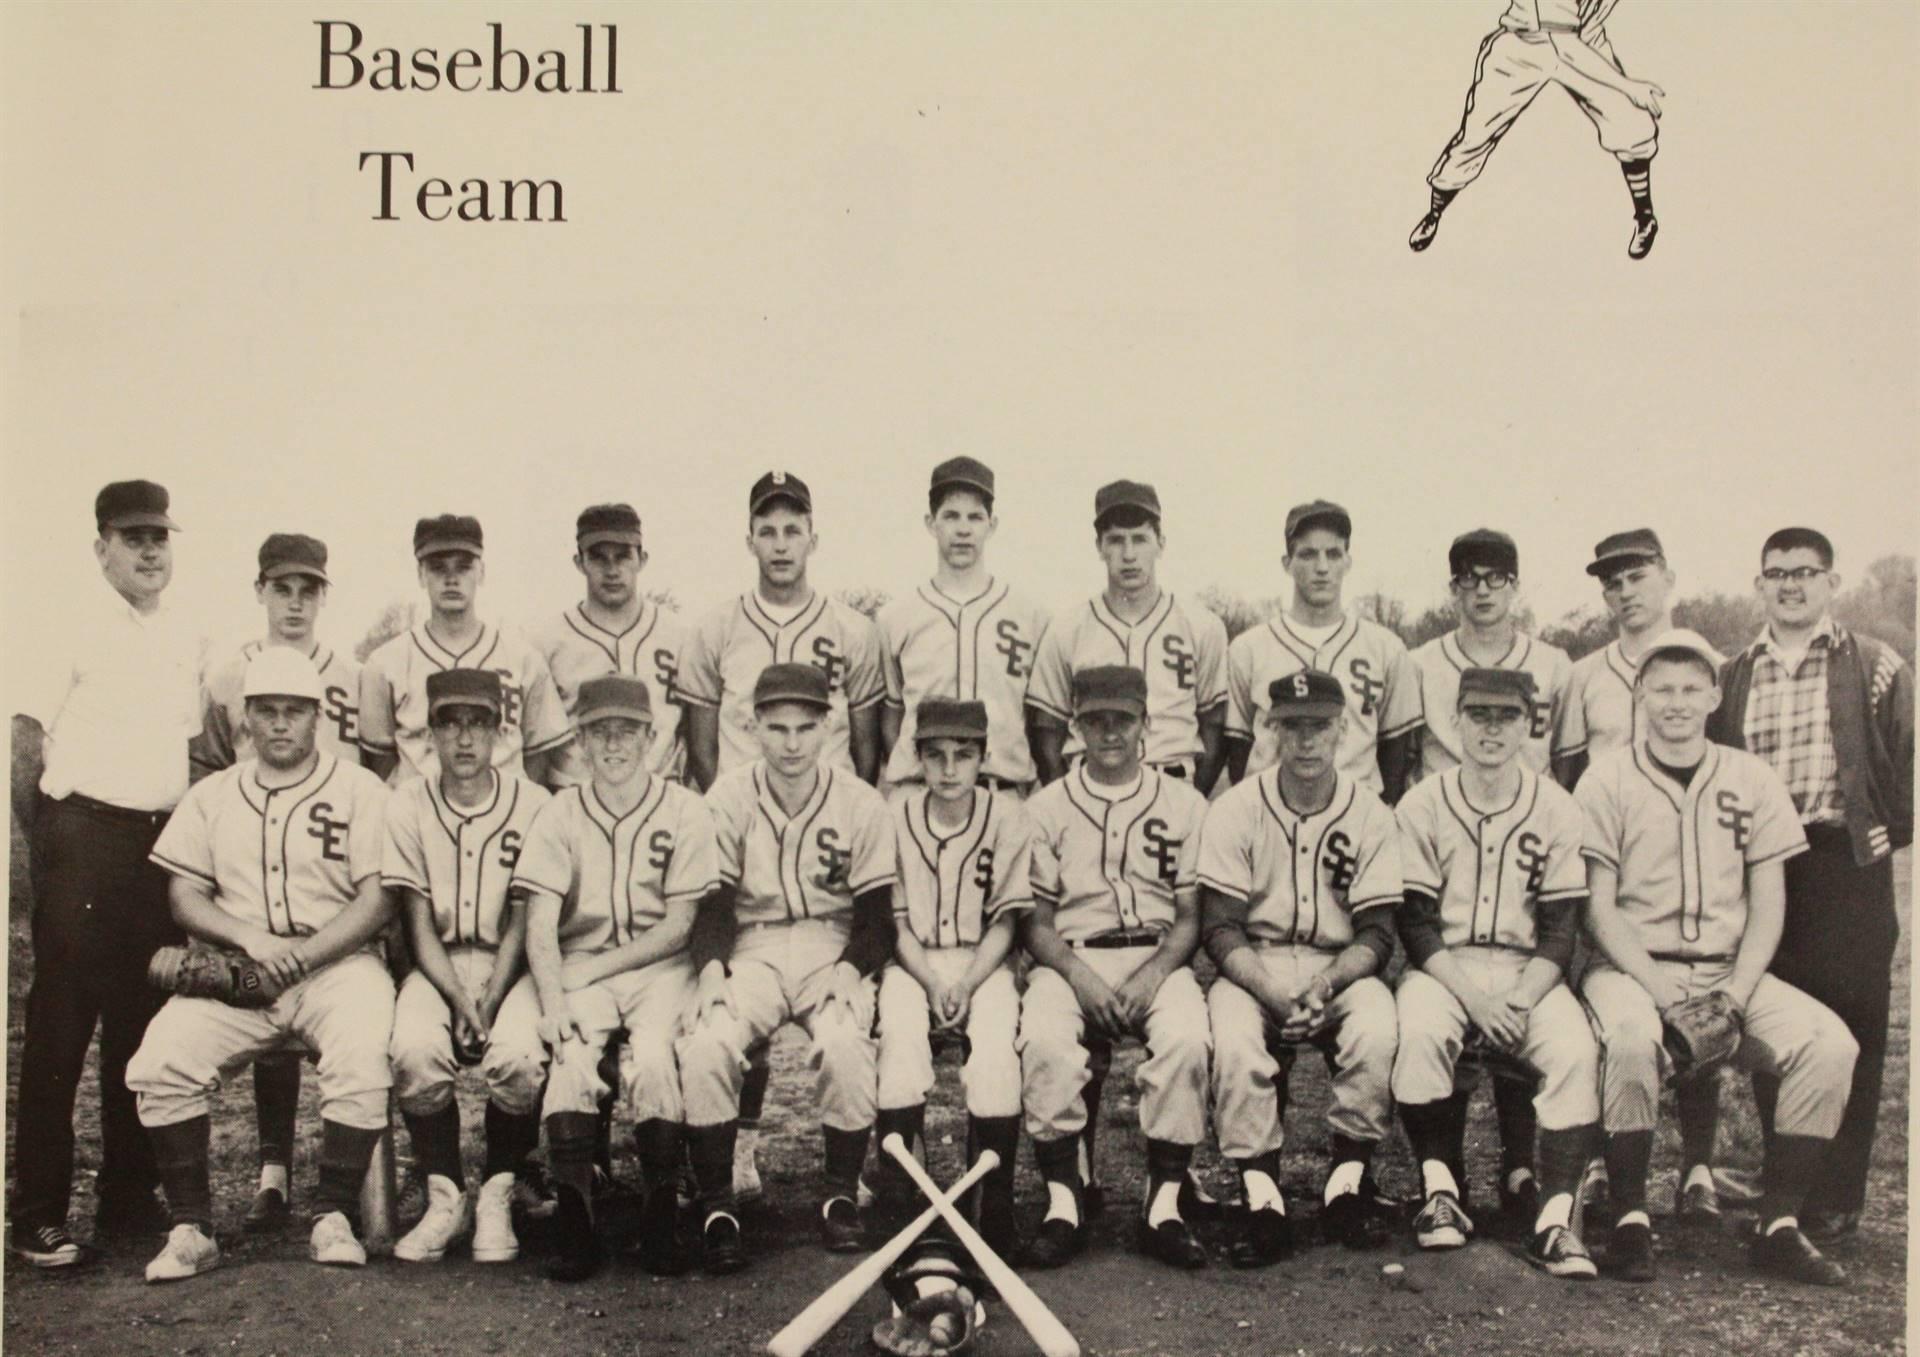 1967 Baseball team